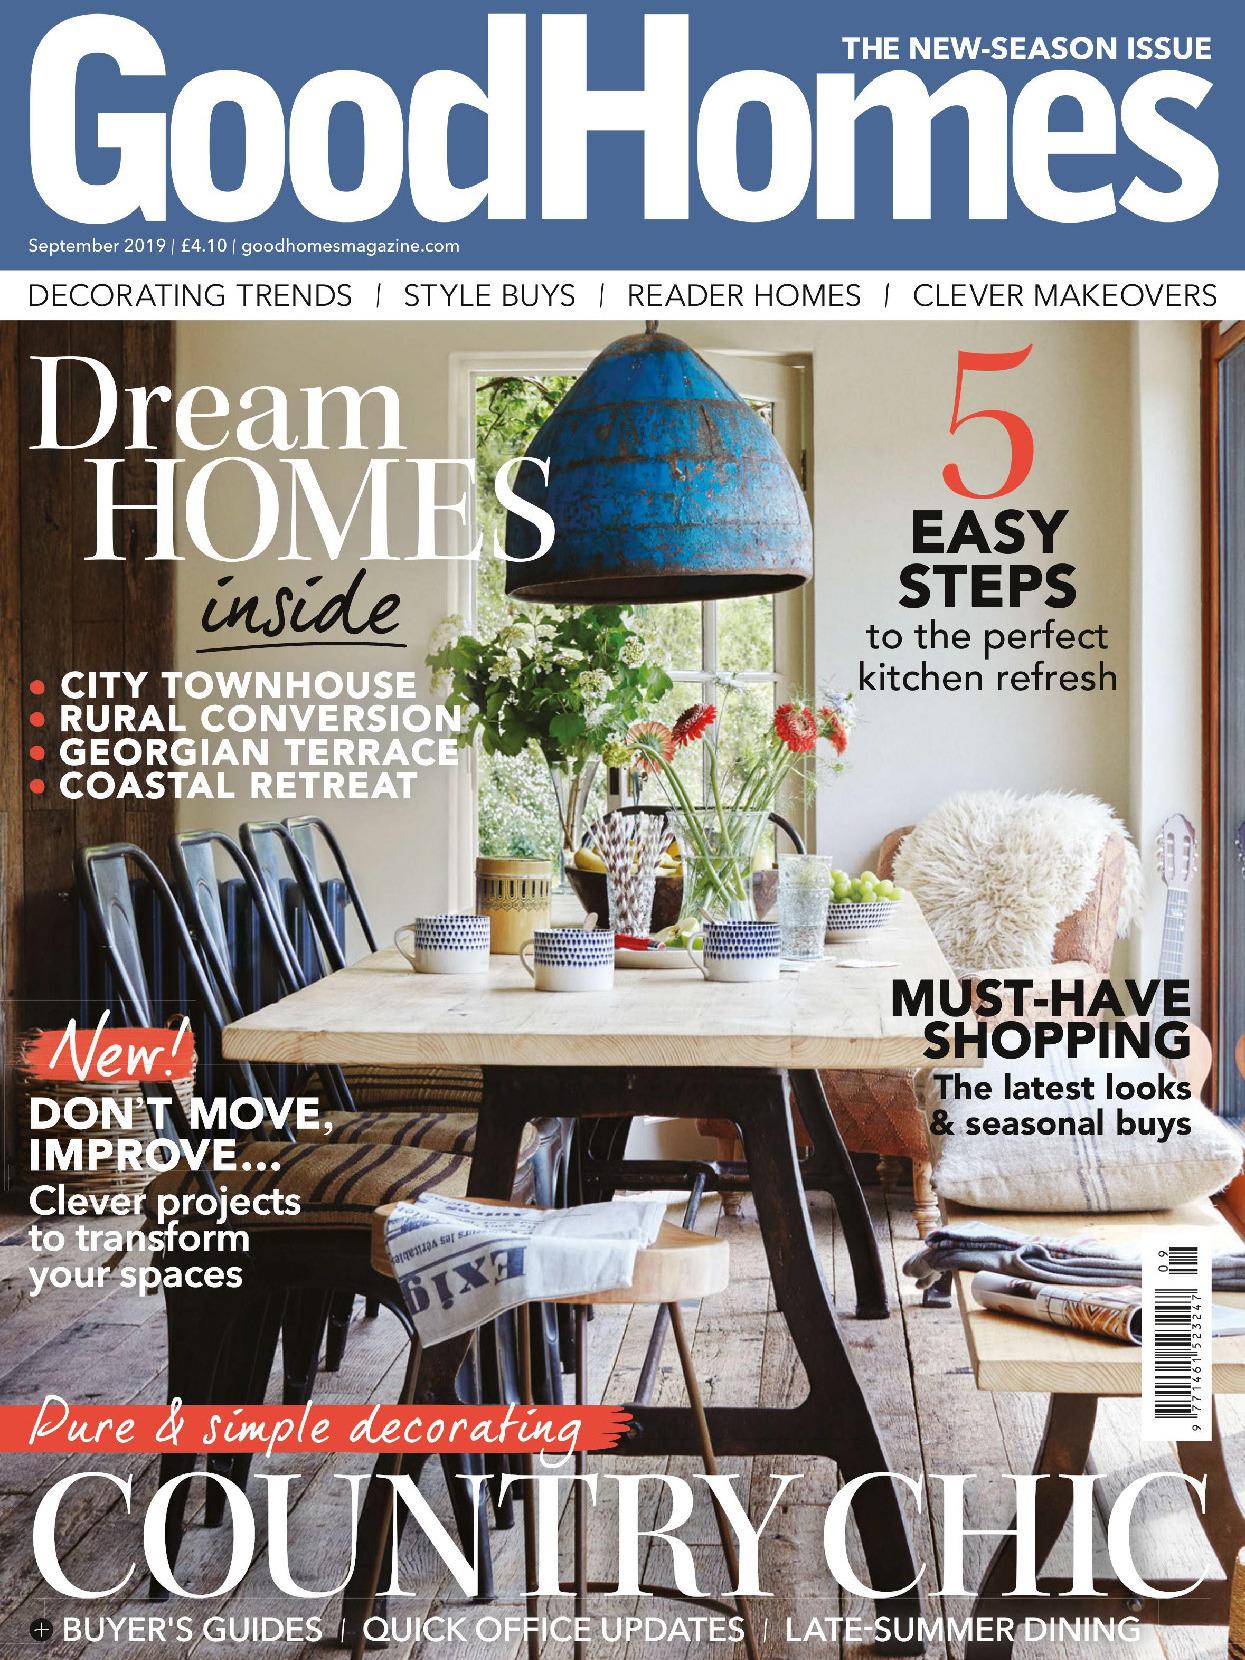 《Good Homes》英国版居家室内设计杂志2019年09月号